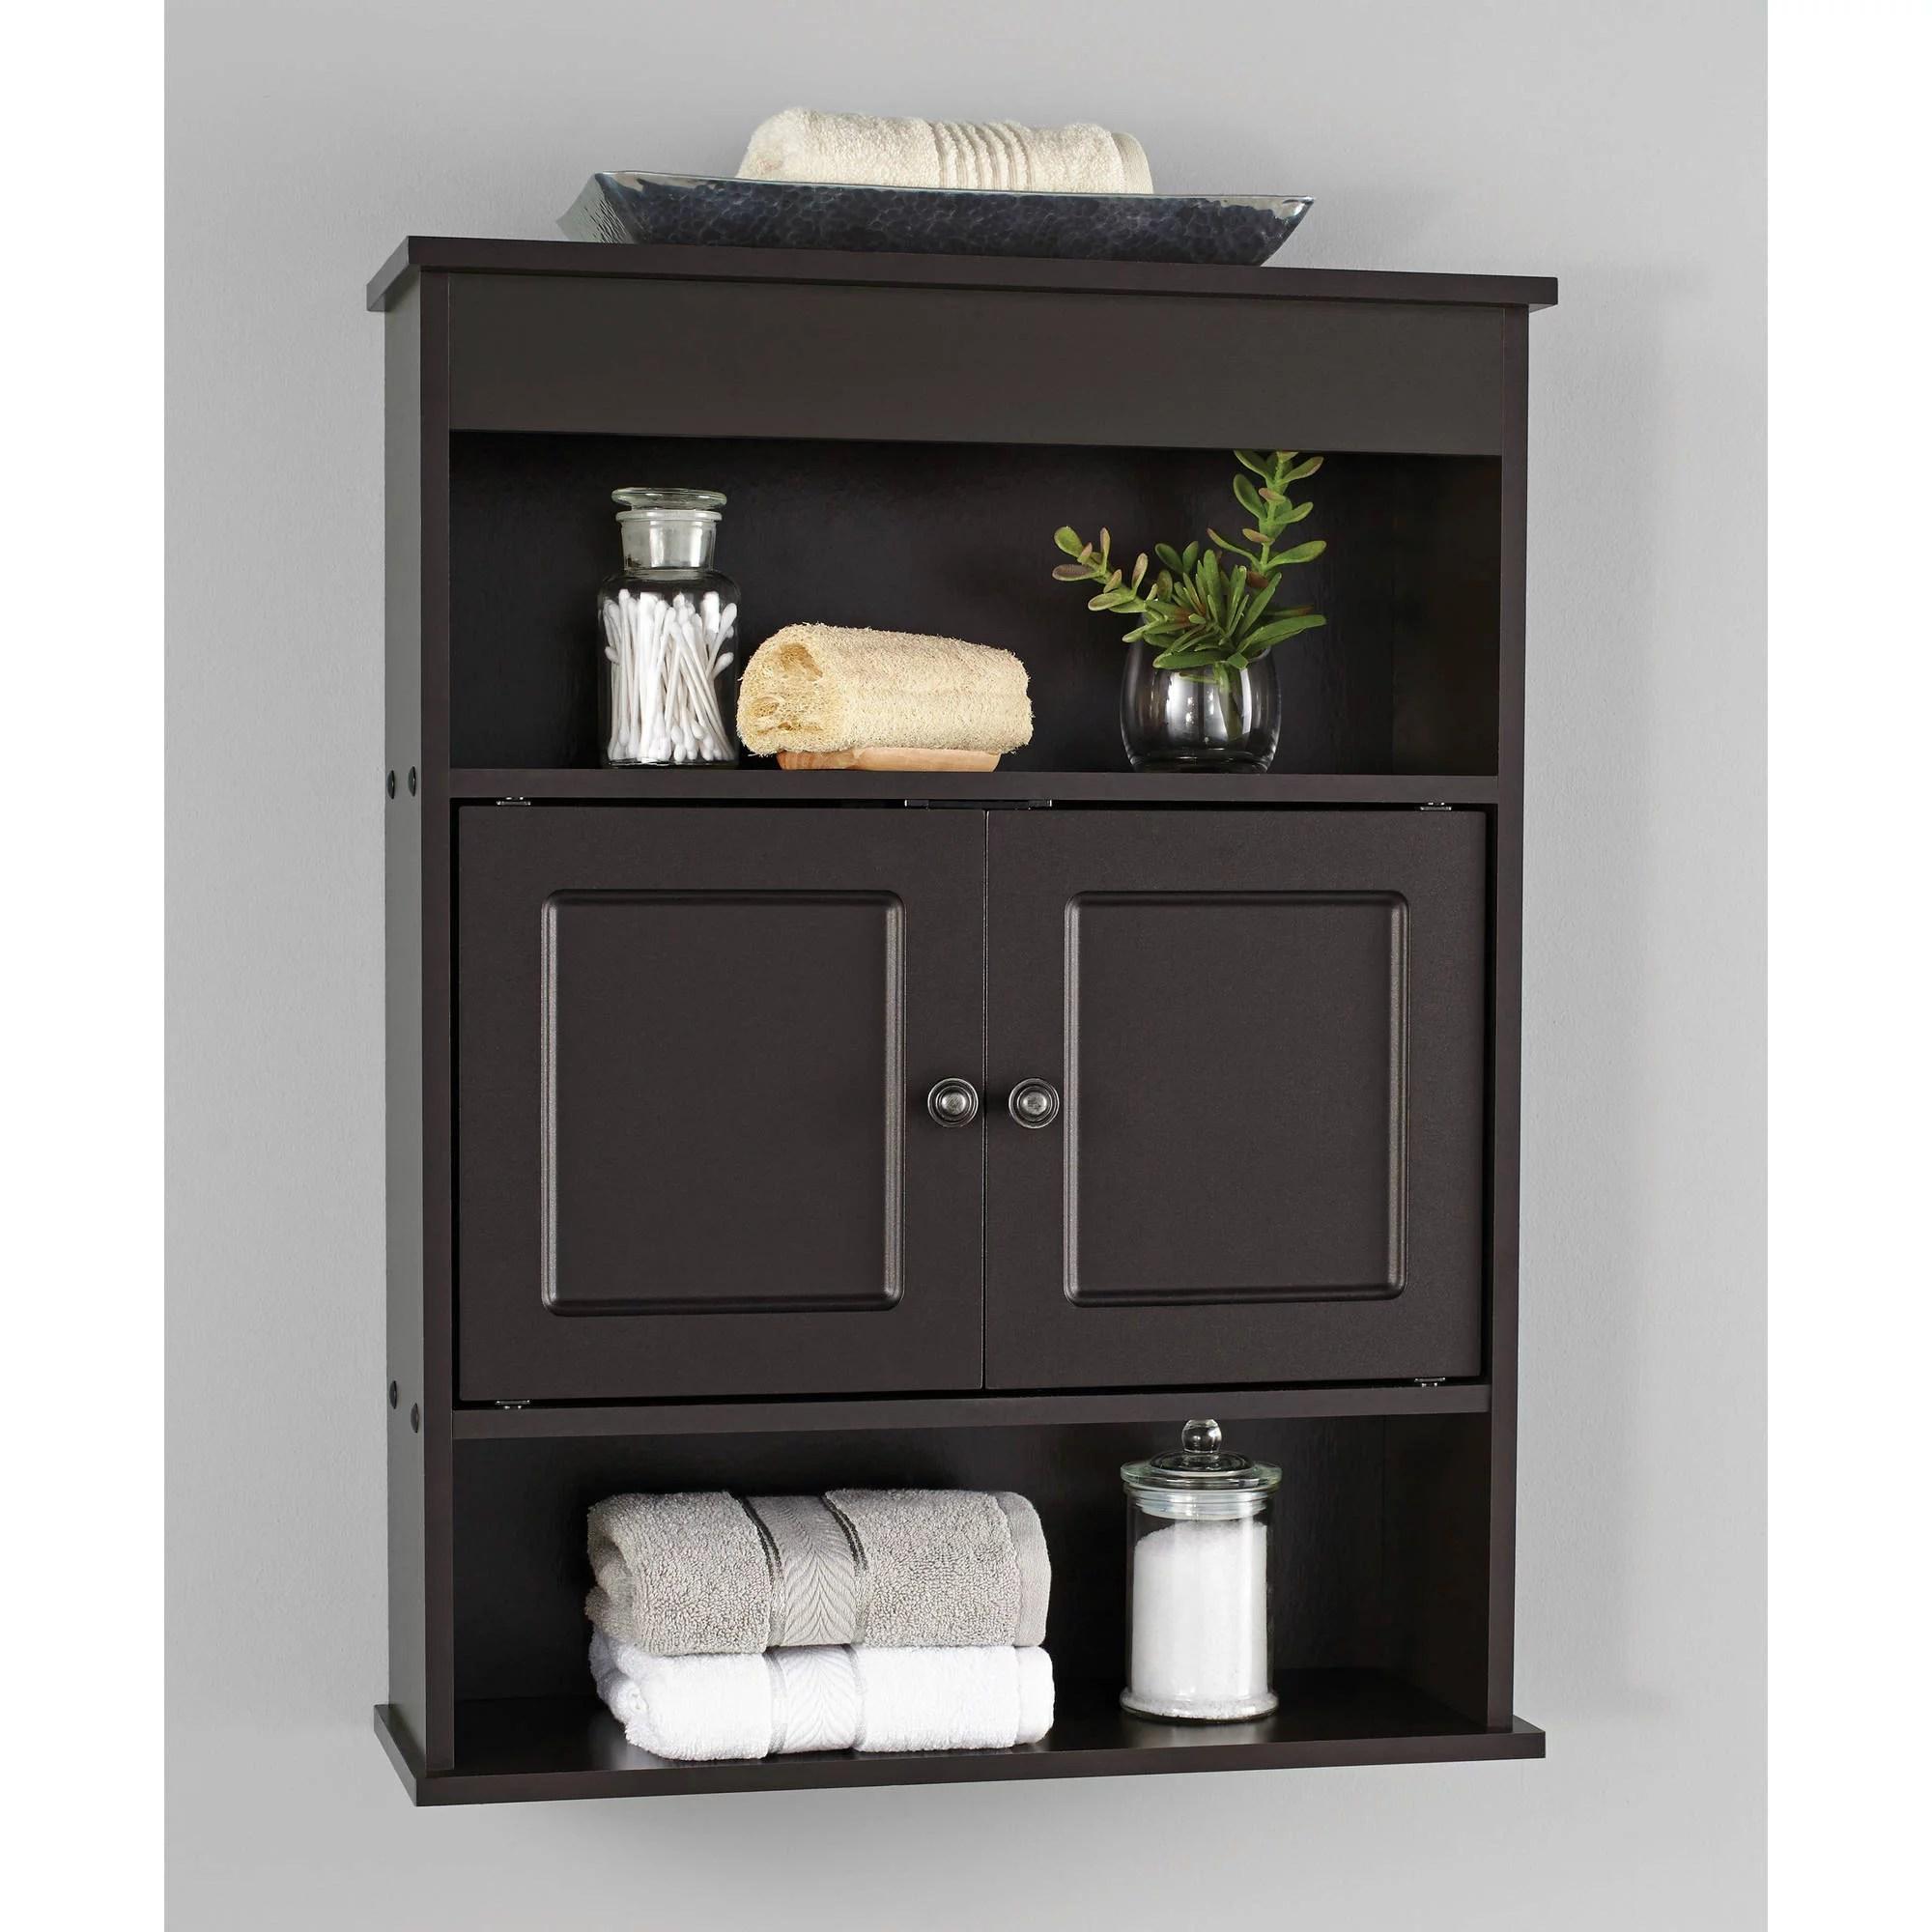 Chapter Bathroom Wall Cabinet, Espresso